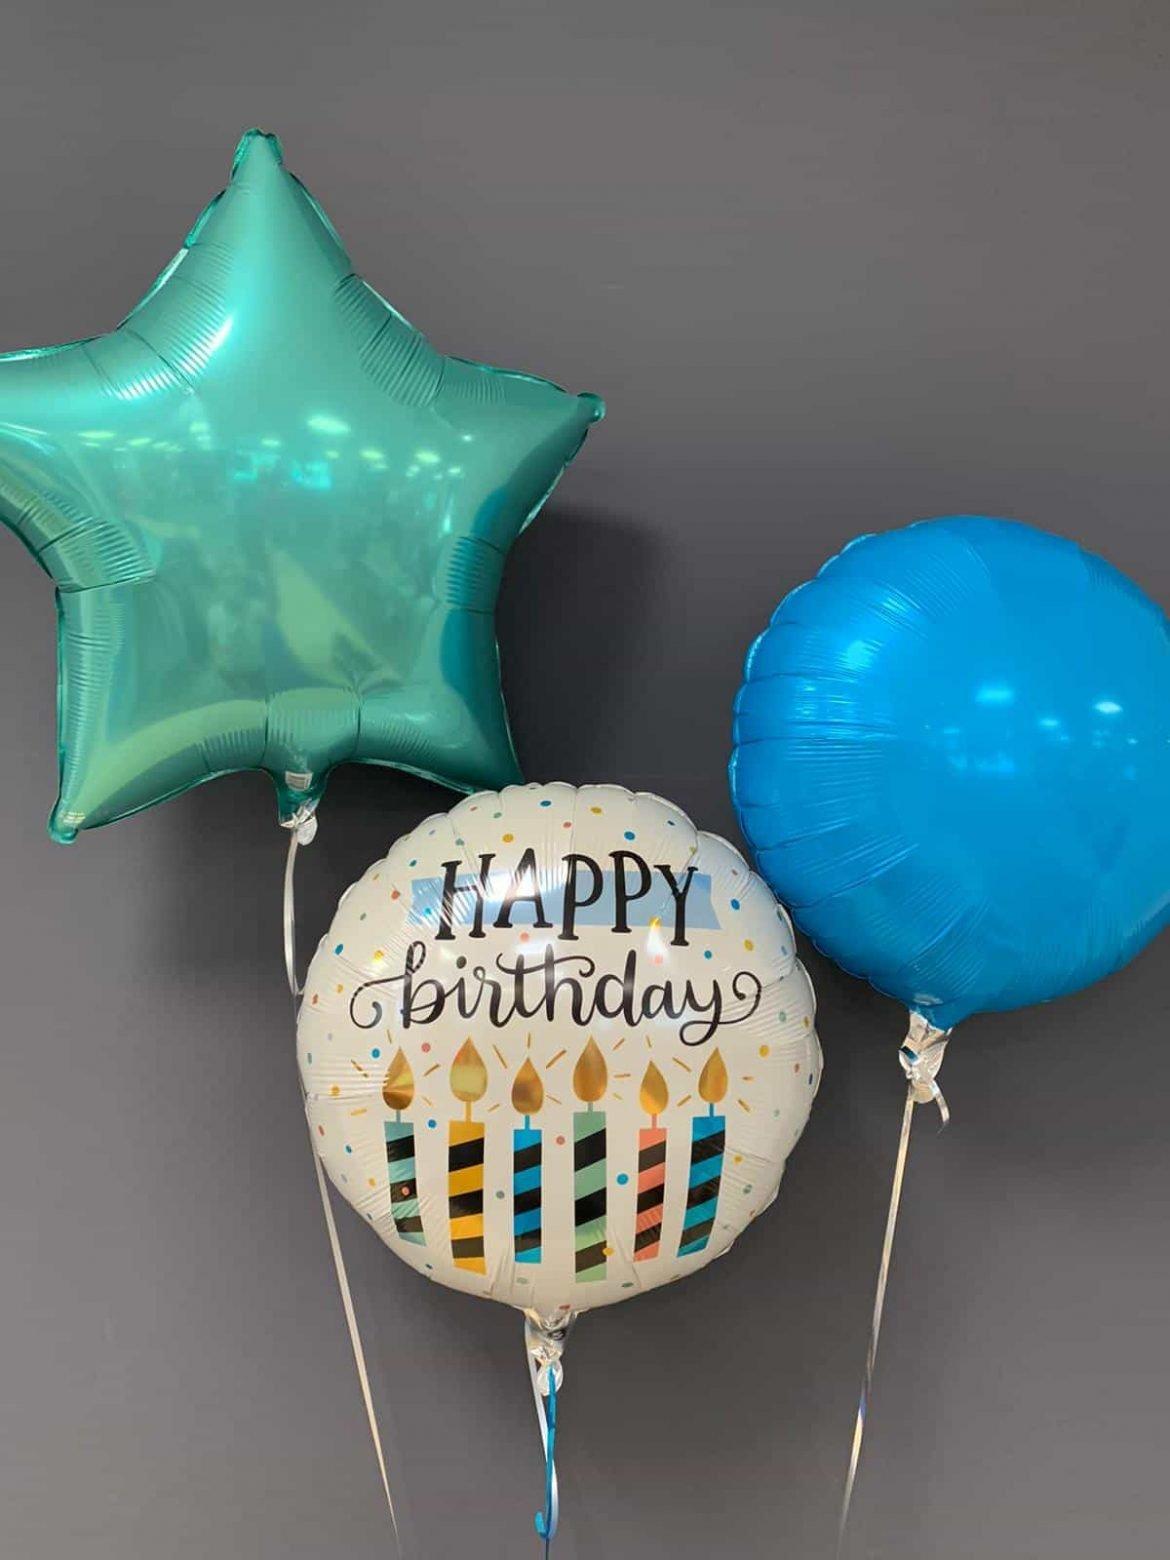 Happy Birthday €5,50<br />Dekoballons farbig €4,50 1